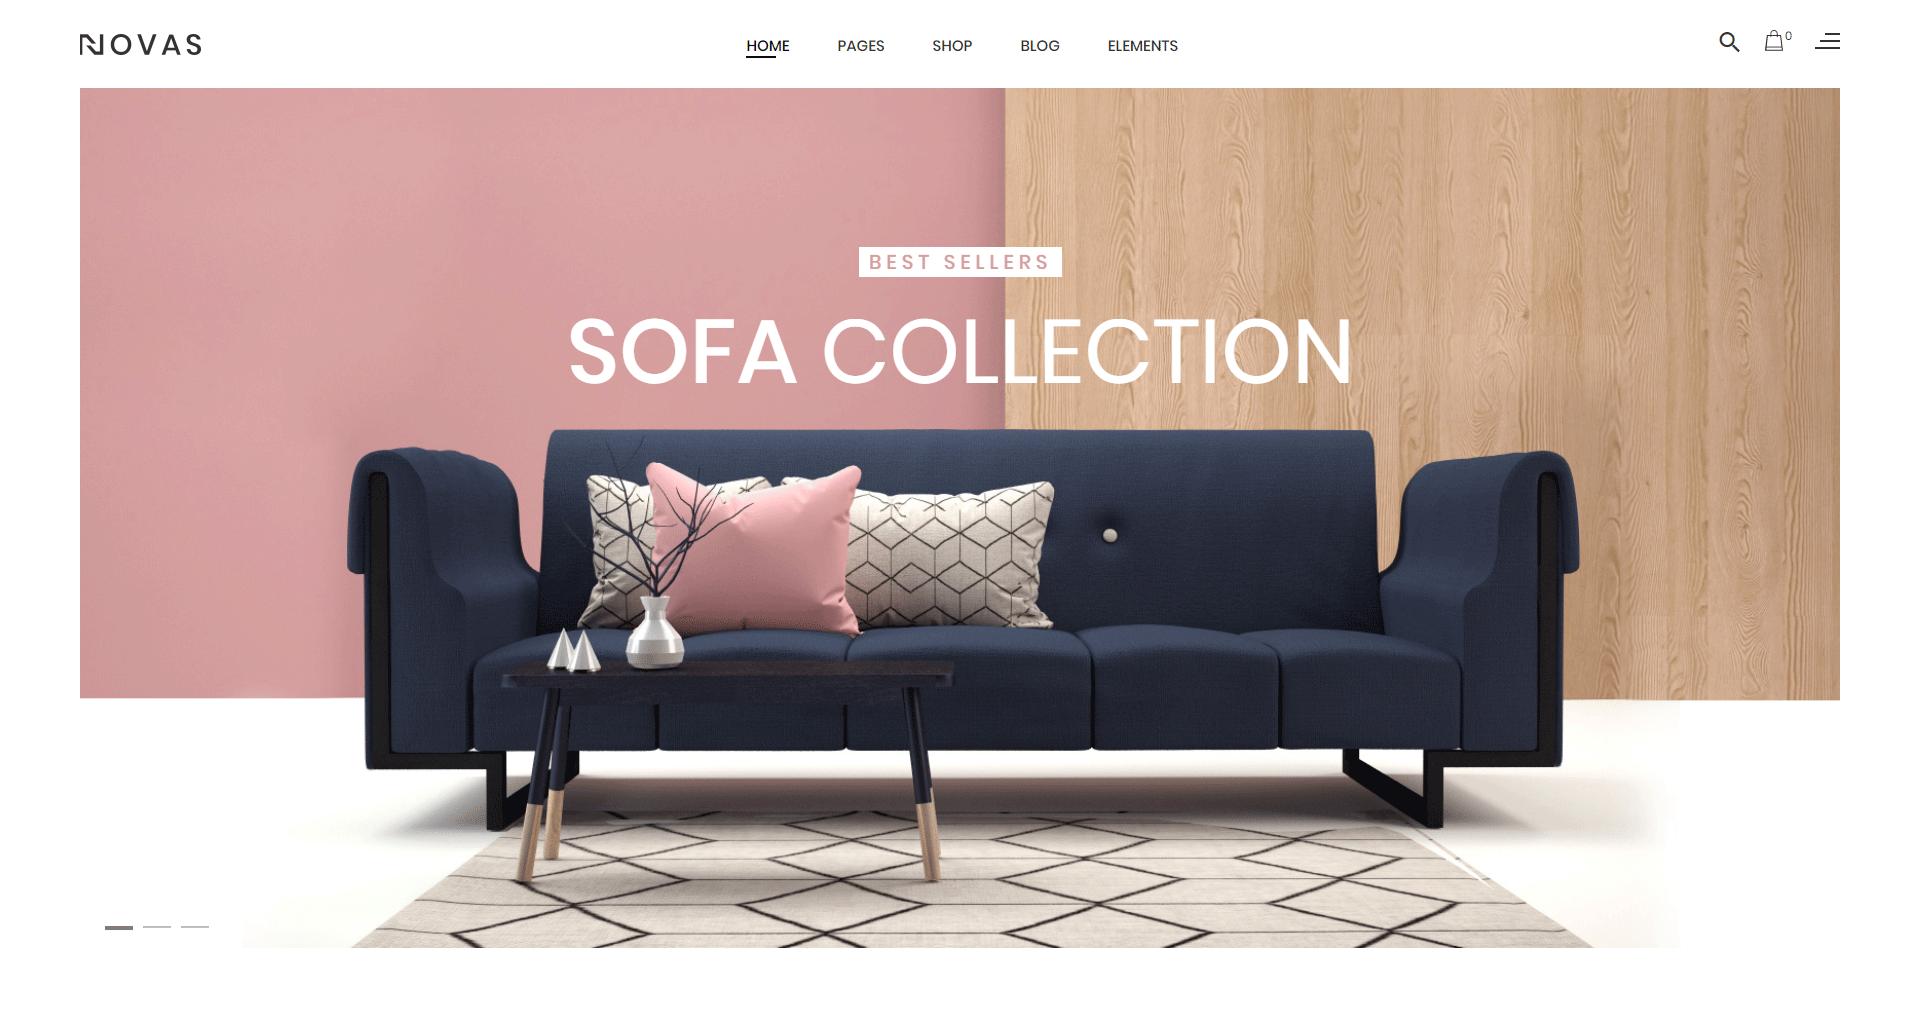 Novas - Furniture Store and Handmade Shop WordPress Theme